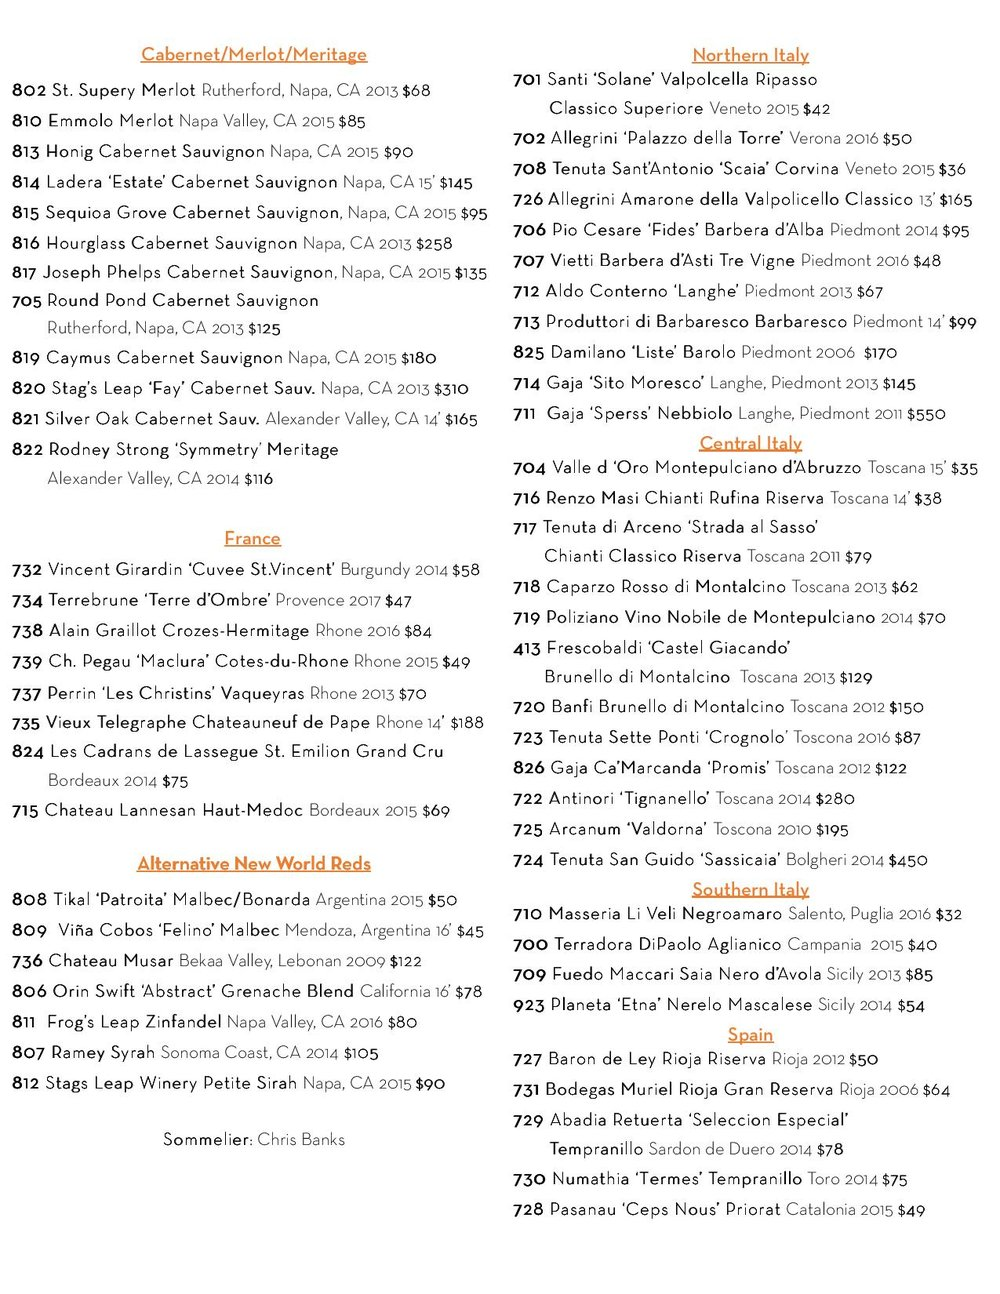 New Wine List 11.25.18-page-002.jpg